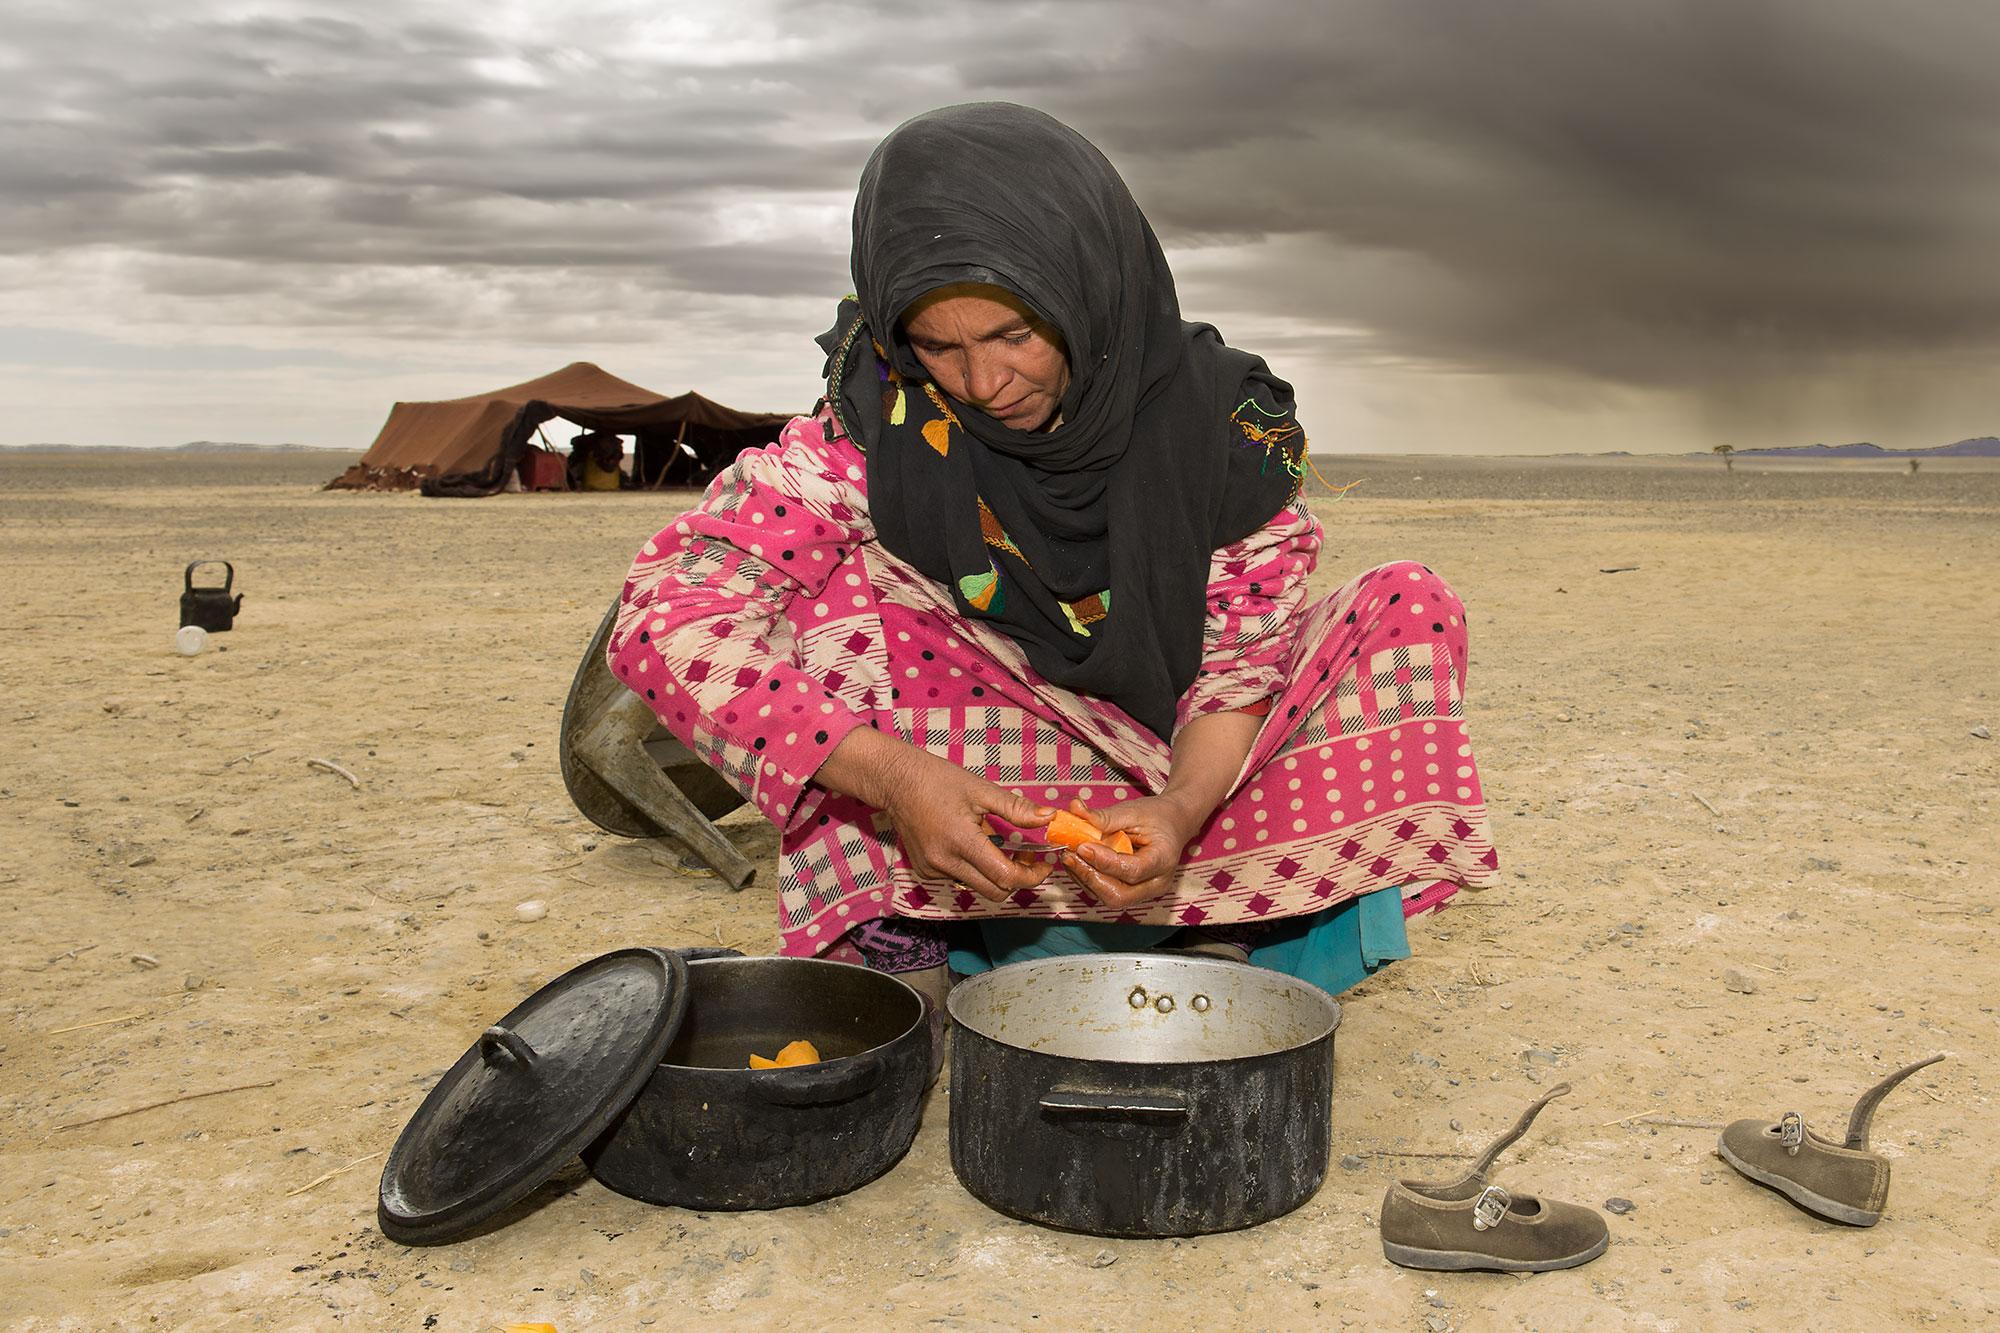 Berber Woman cooking outside Sahara Desert Morocco